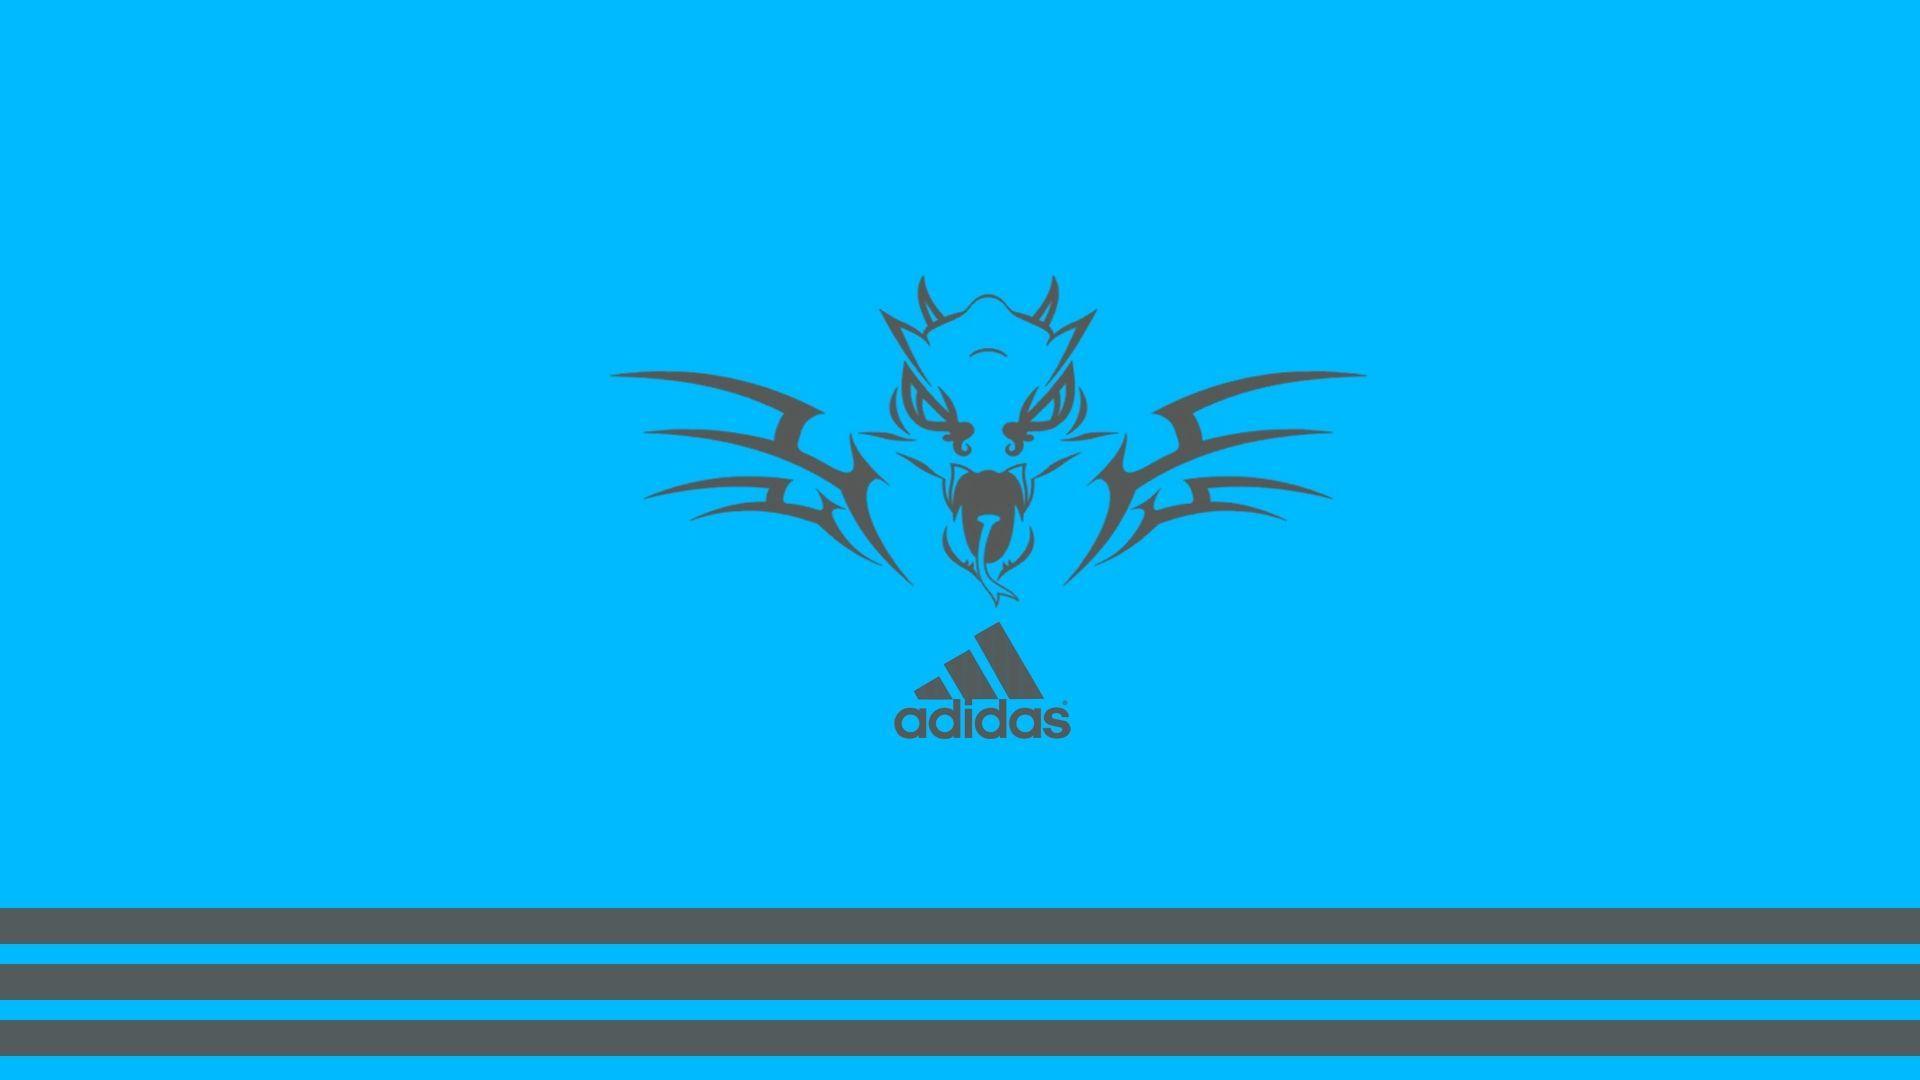 Adidas Logo Wallpapers 2016 - Wallpaper Cave